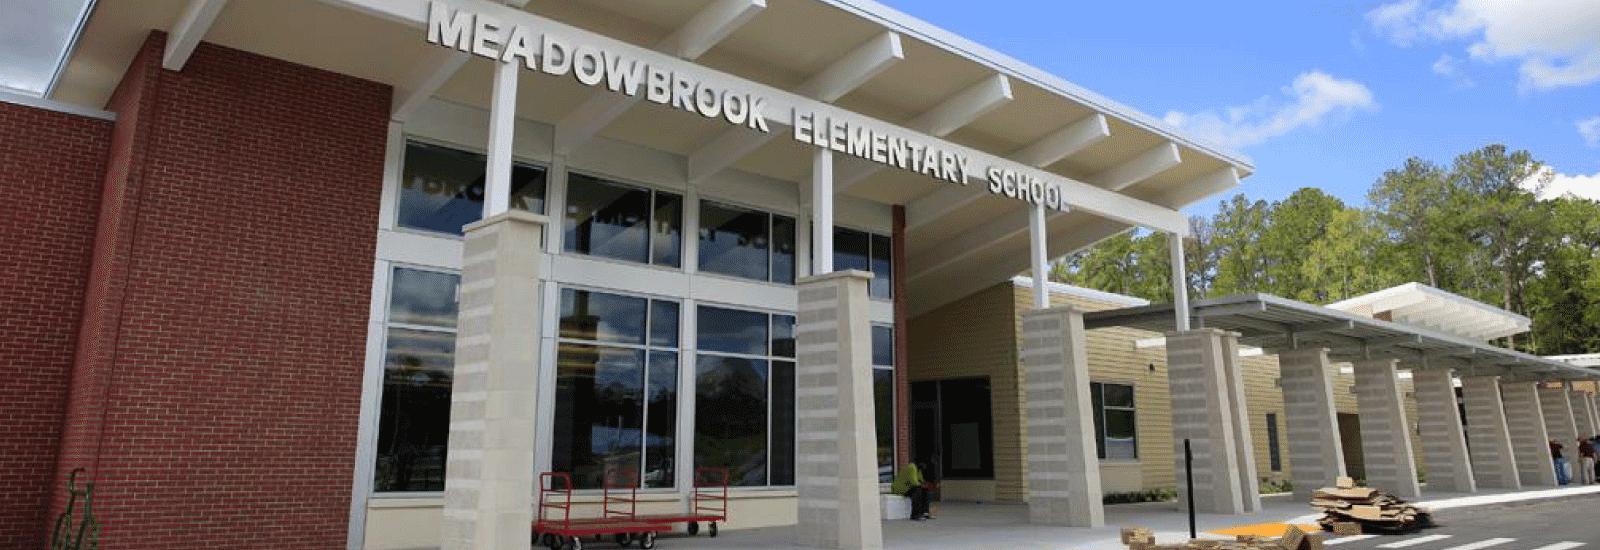 Meadowbrook Elementary School, Rapid City, SD